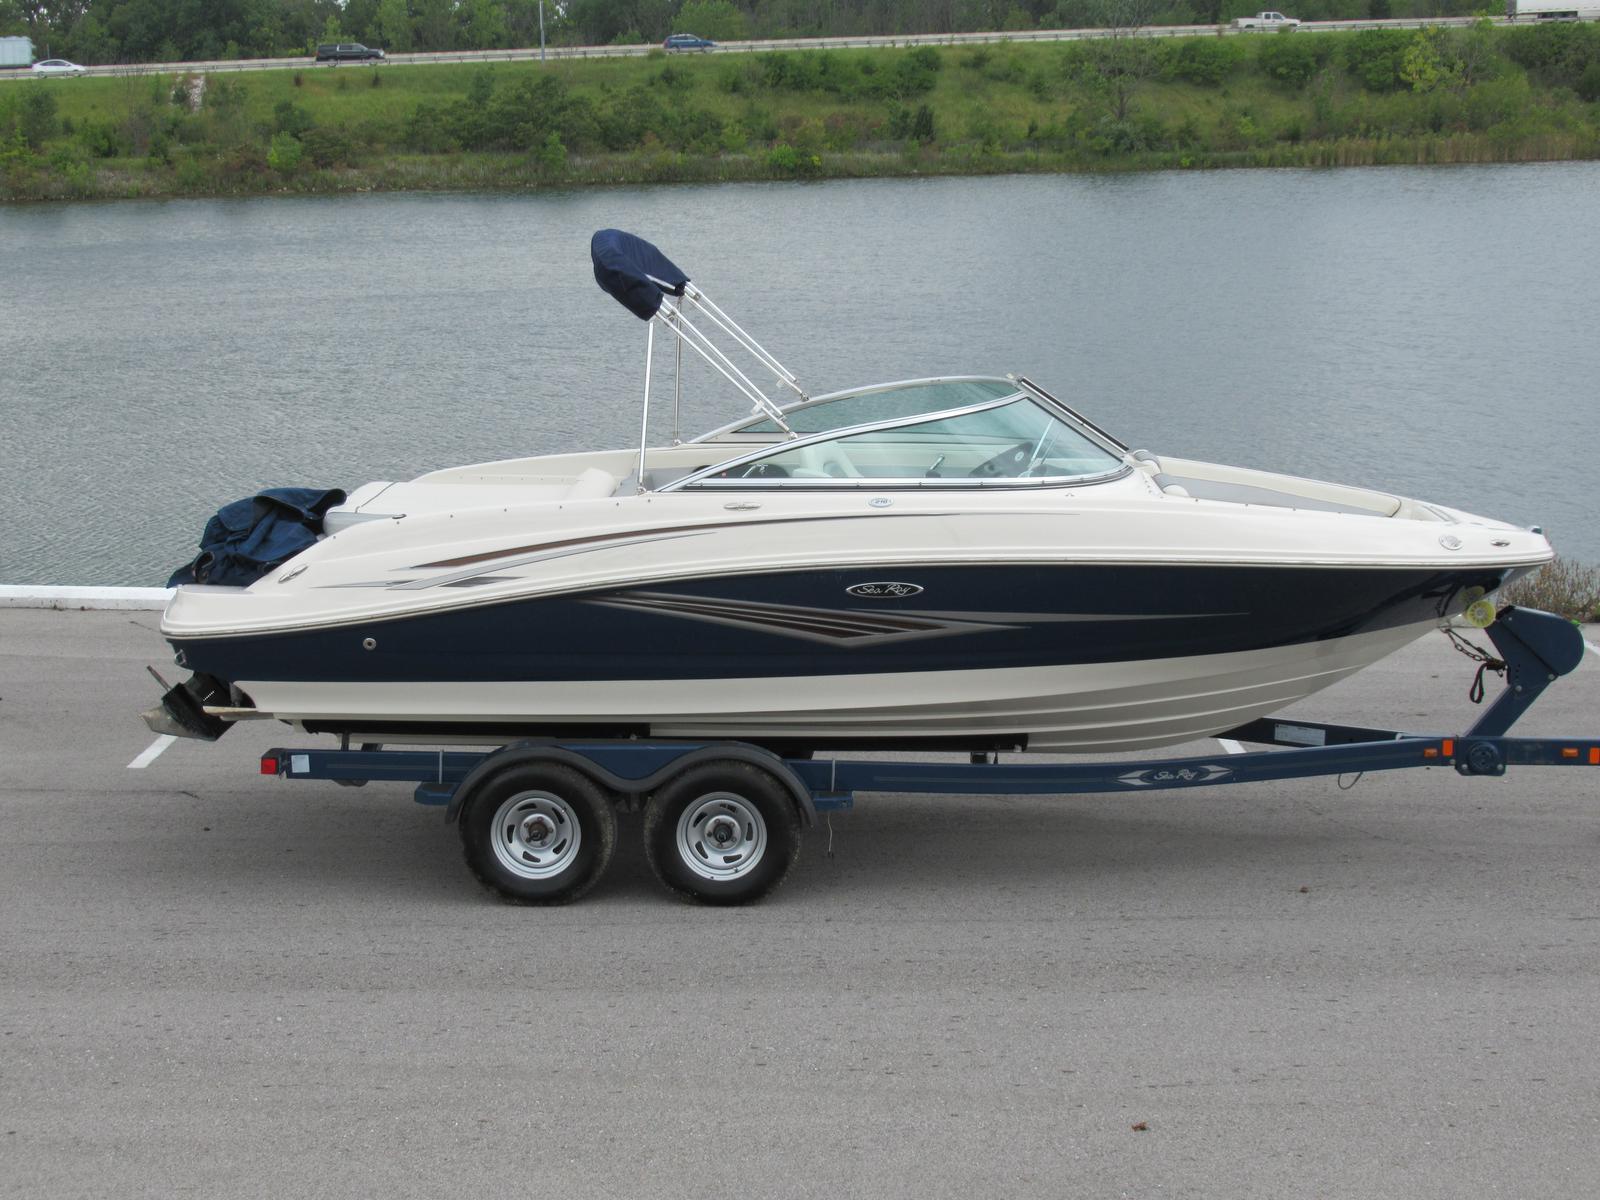 2010 Sea Ray 210 Select Boat